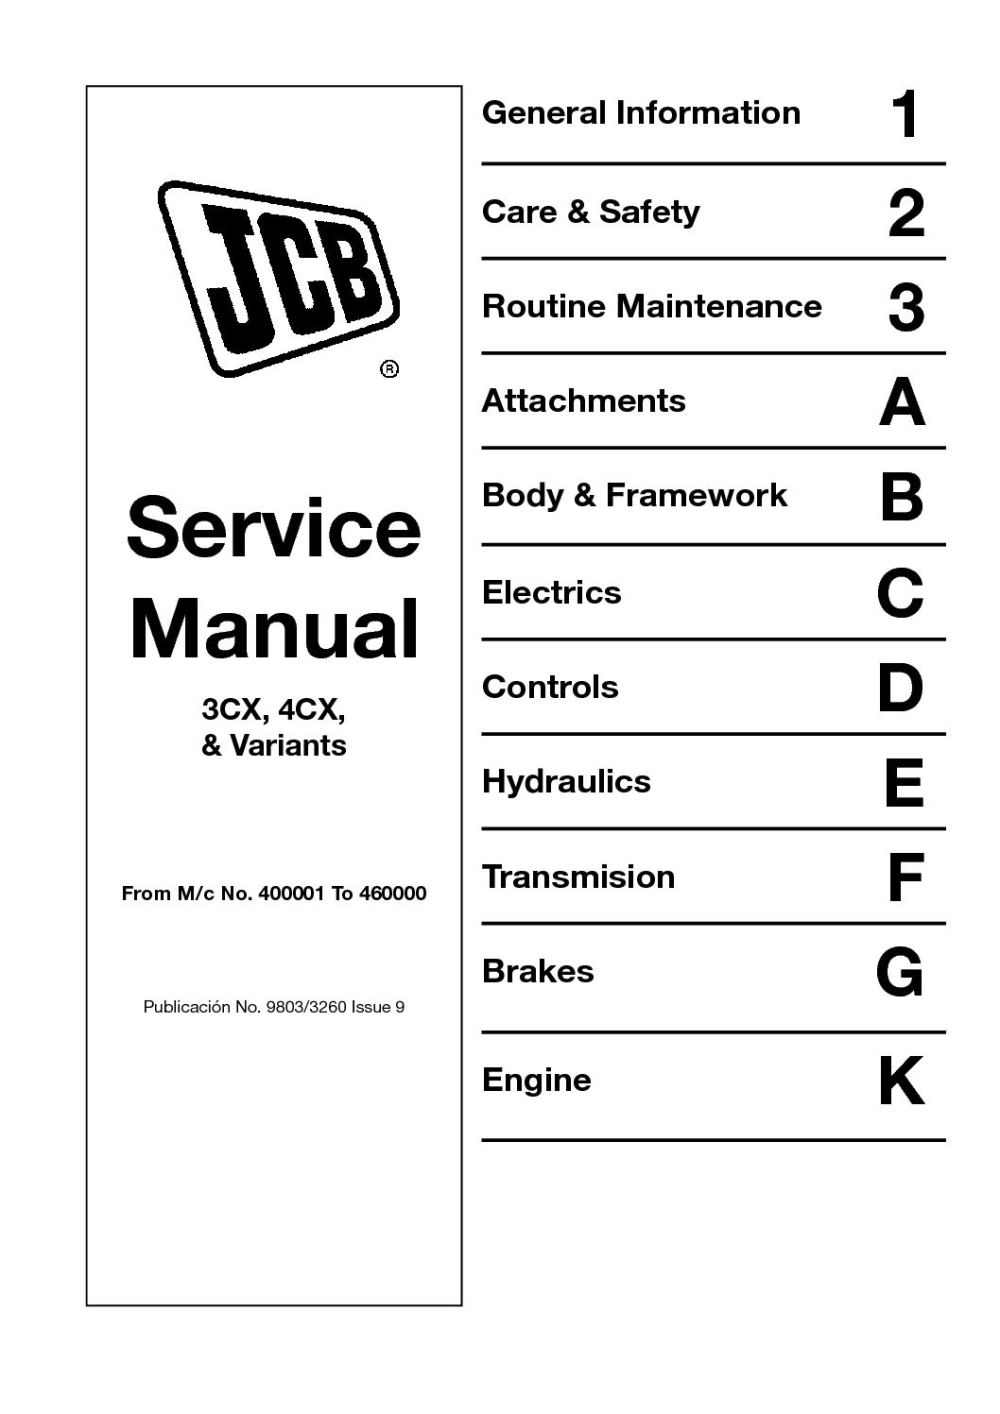 medium resolution of calam o jcb 4cx backhoe loader service repair manual sn400001 to 4600000